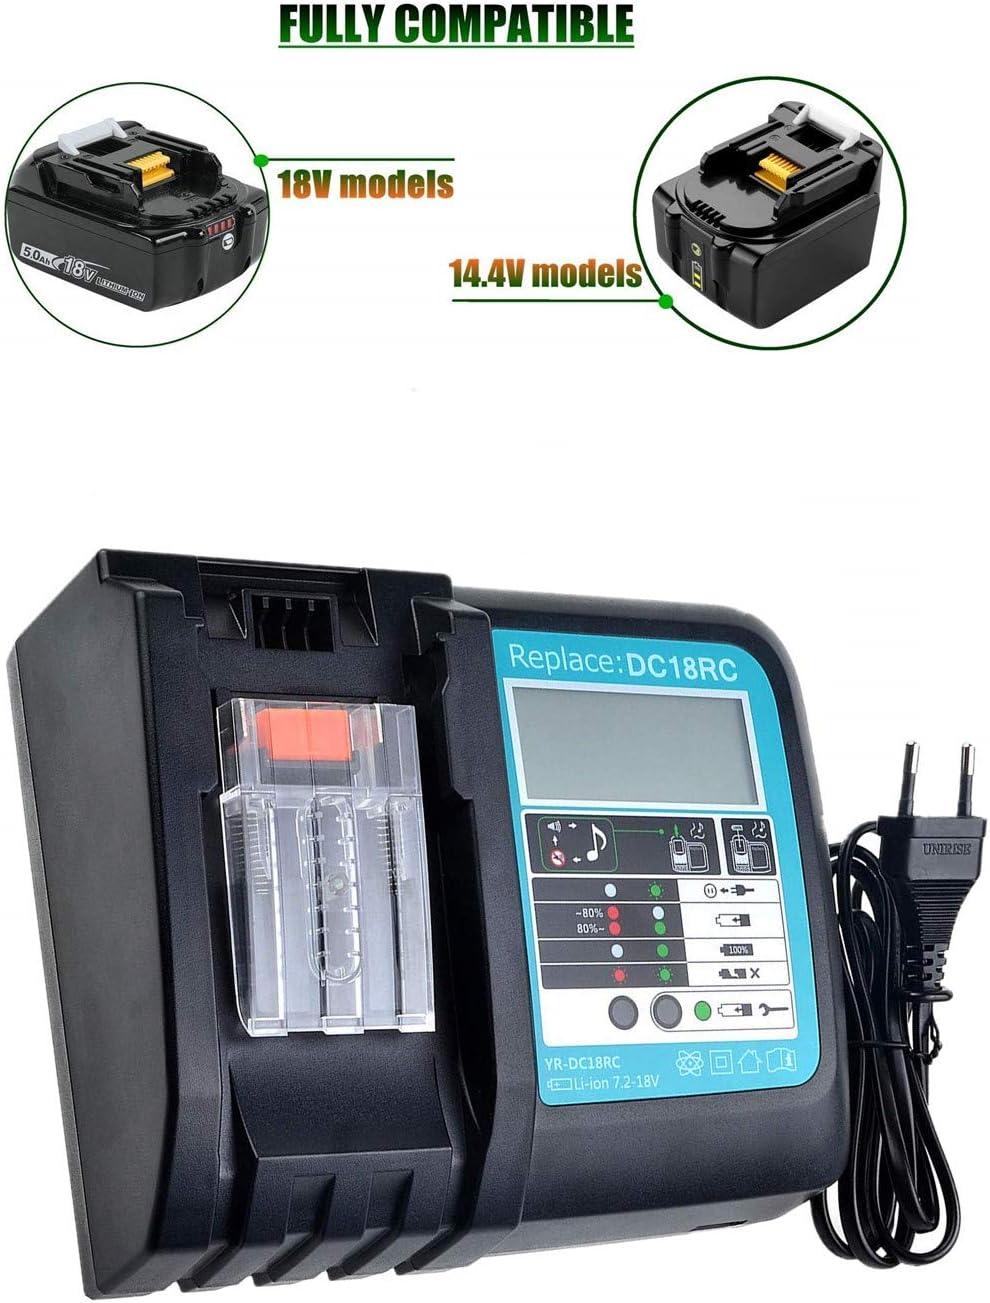 Ersatz 18V Ladeger/ät f/ür Makita Lithium-Ionen Akku mit LED Indikator Multifunktion USB Schnell-Ladeger/ät